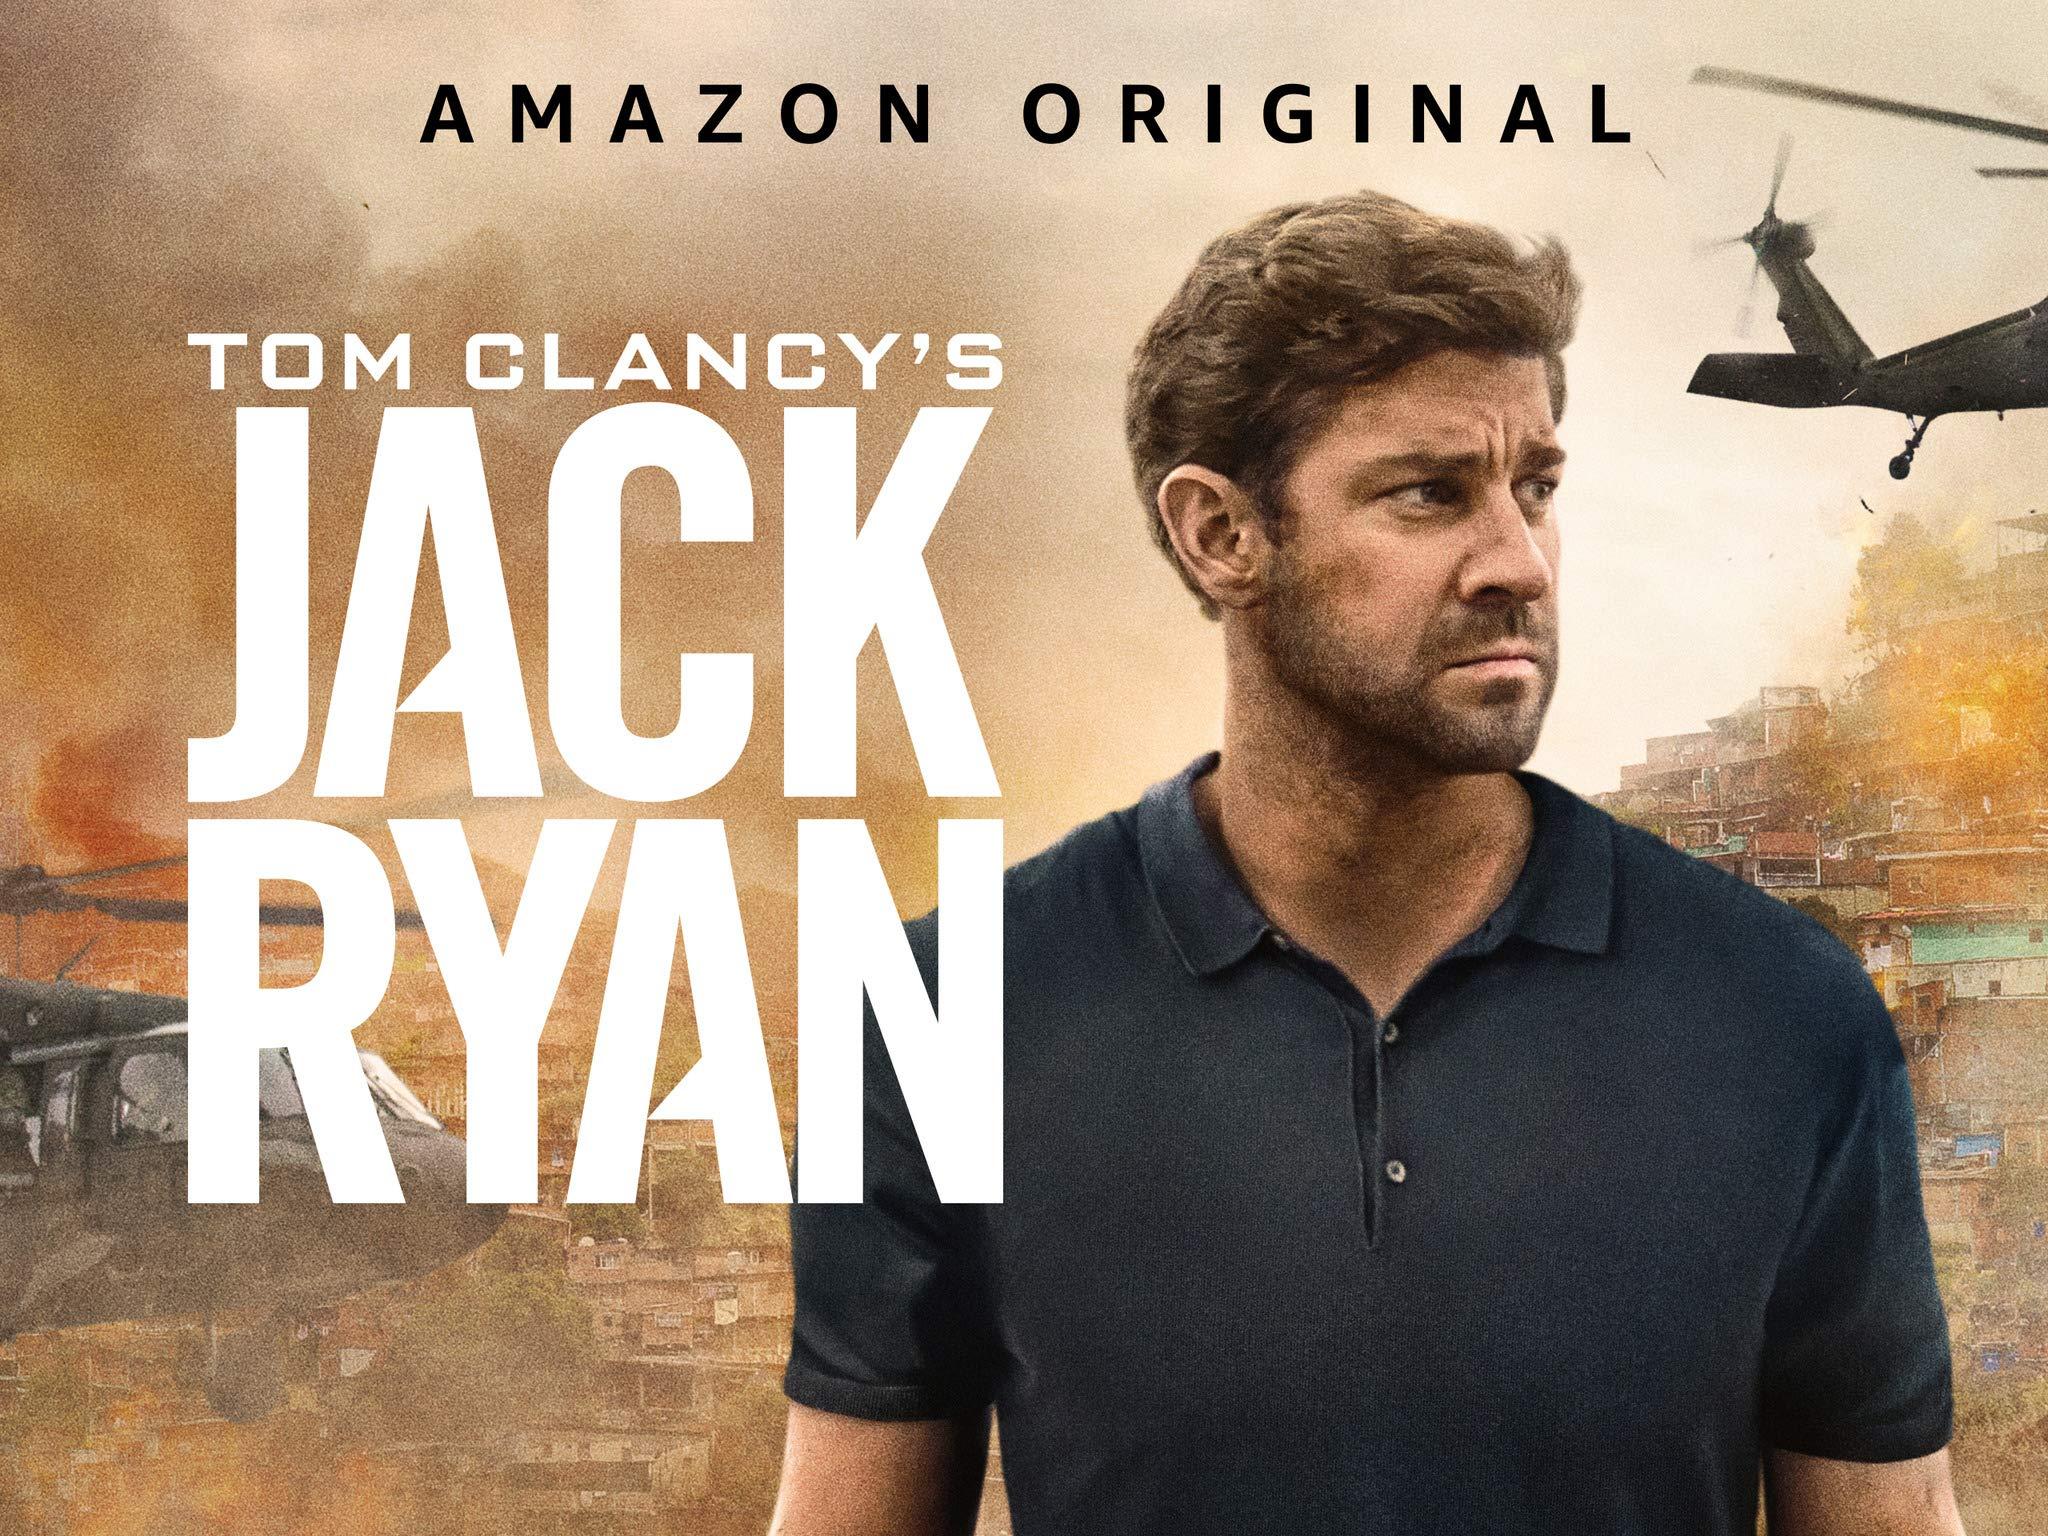 jack ryan season 2 amazon germany when does it start